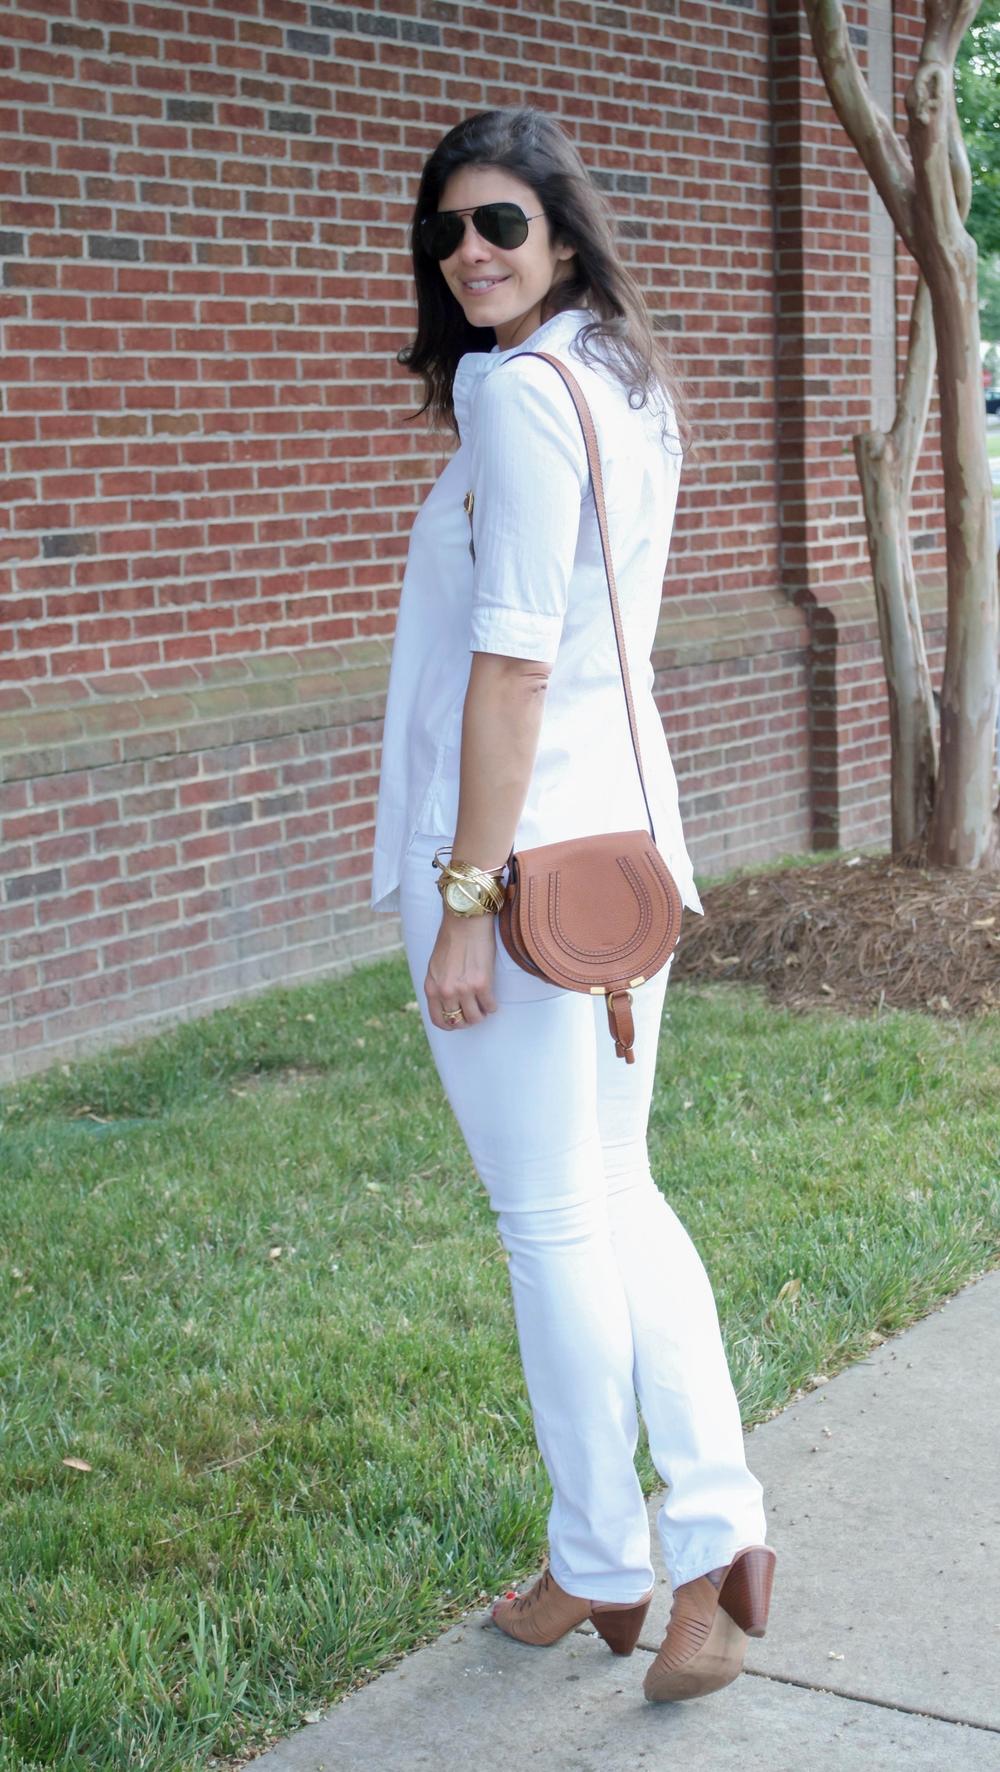 White-On-White-OOTD-LaurenSchwaiger-Lifestyle-Blog.jpg